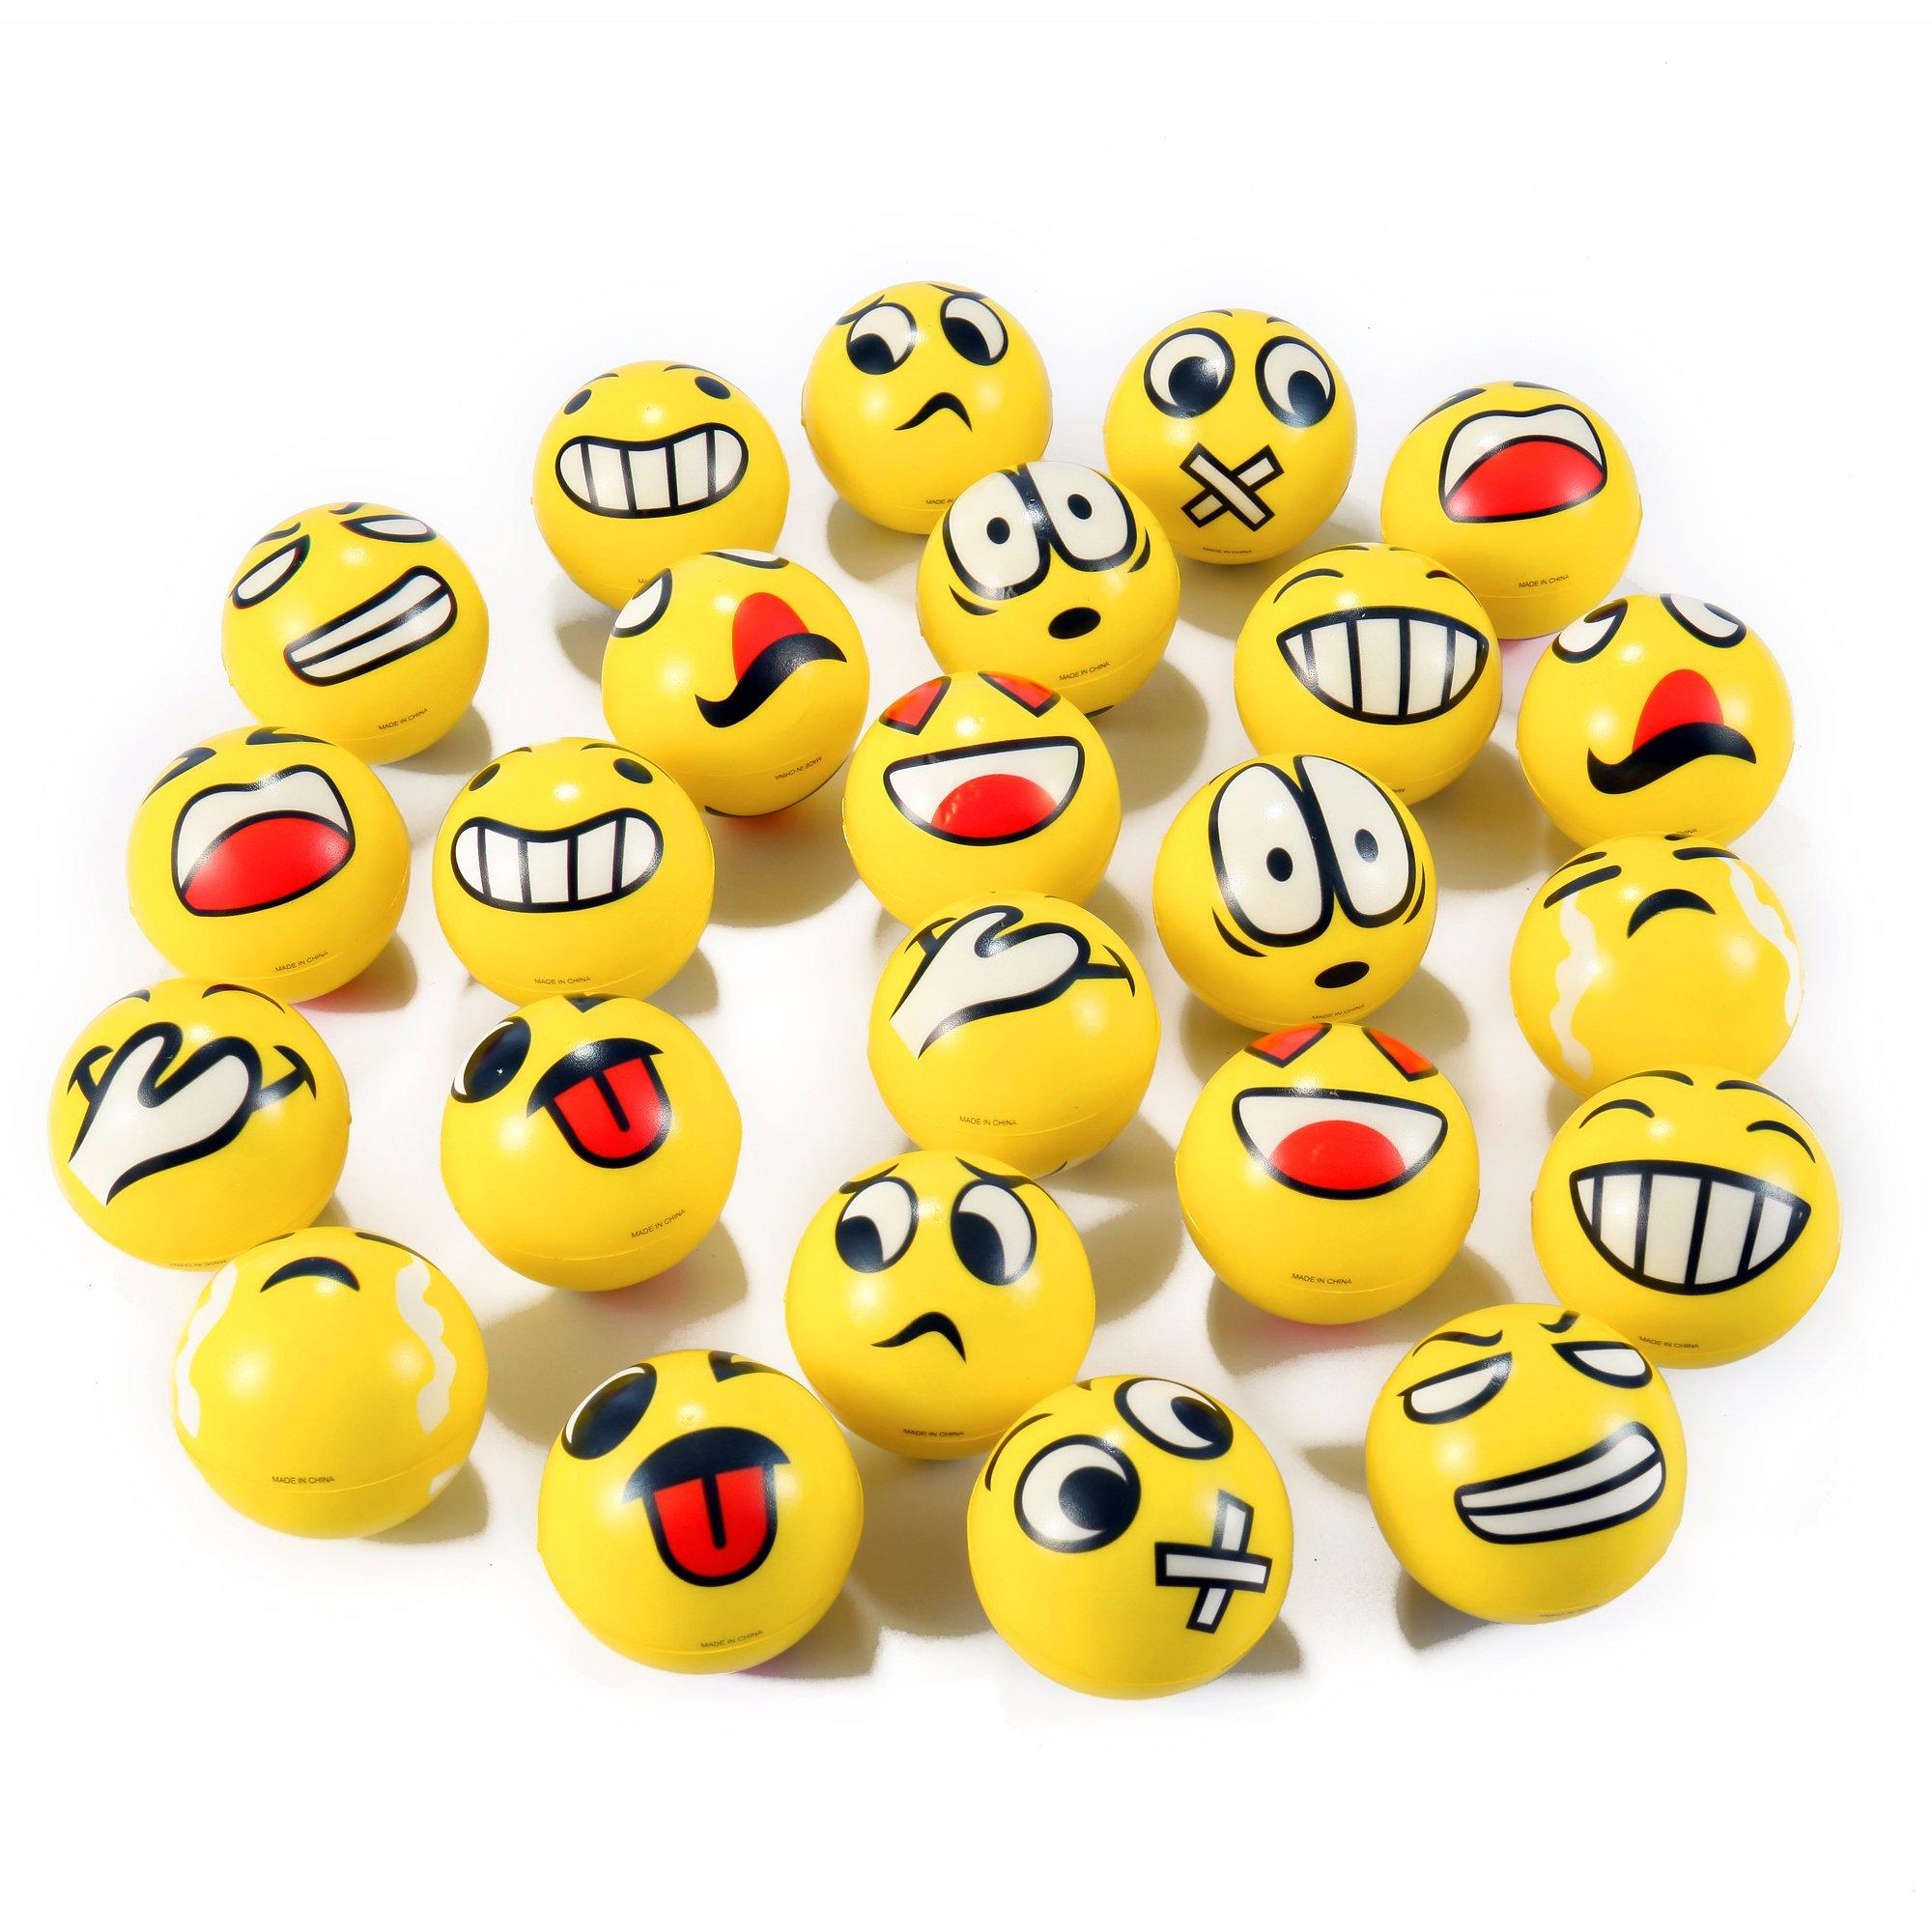 Set of 24 Face Emoji Stress Balls Bulk - Soft Foam Stress Ball Squeeze Toys for Kids (3 inches)